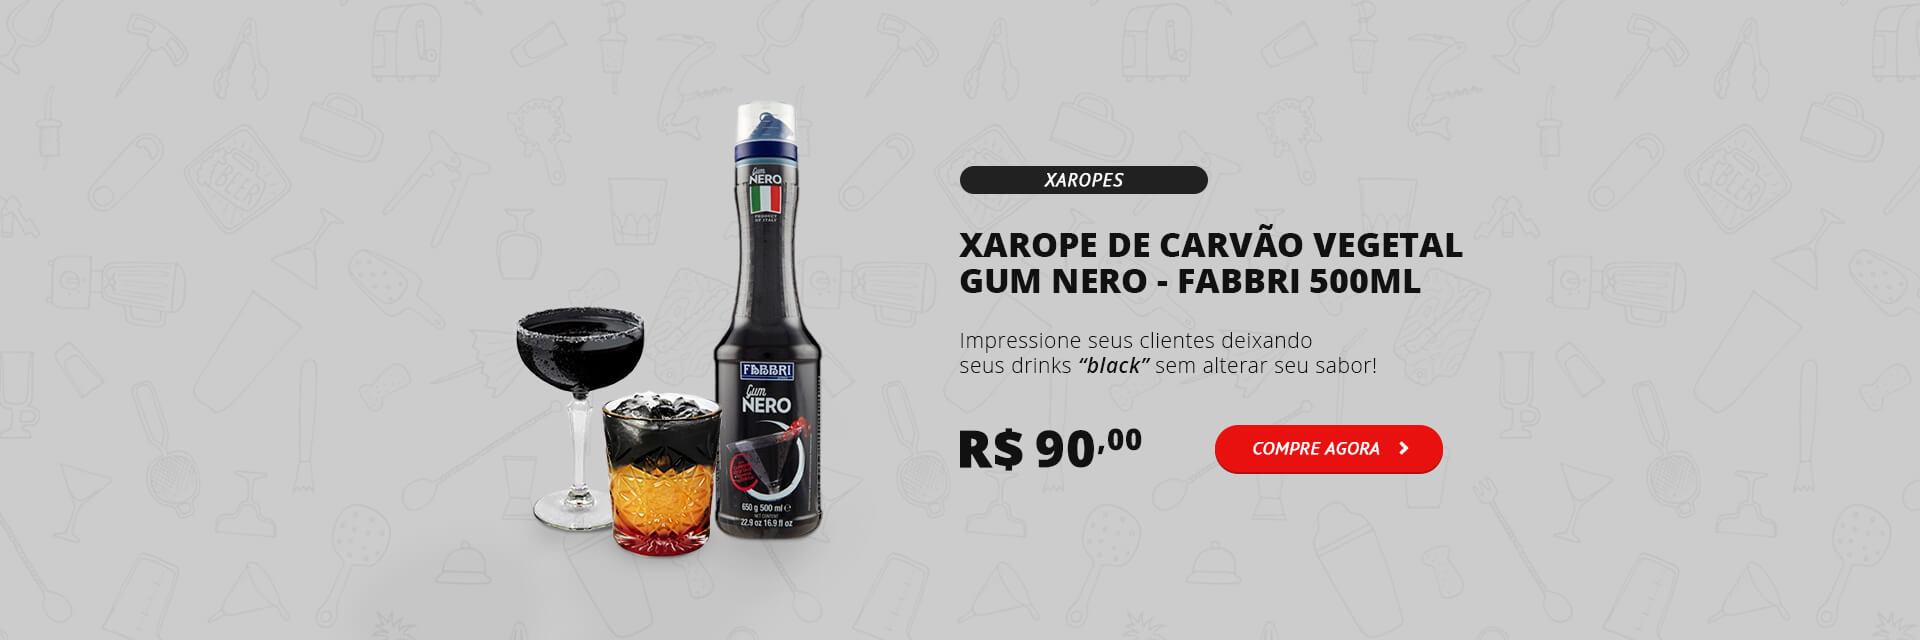 Xarope de Carvão Vegetal Gum Nero Fabbri 500ml